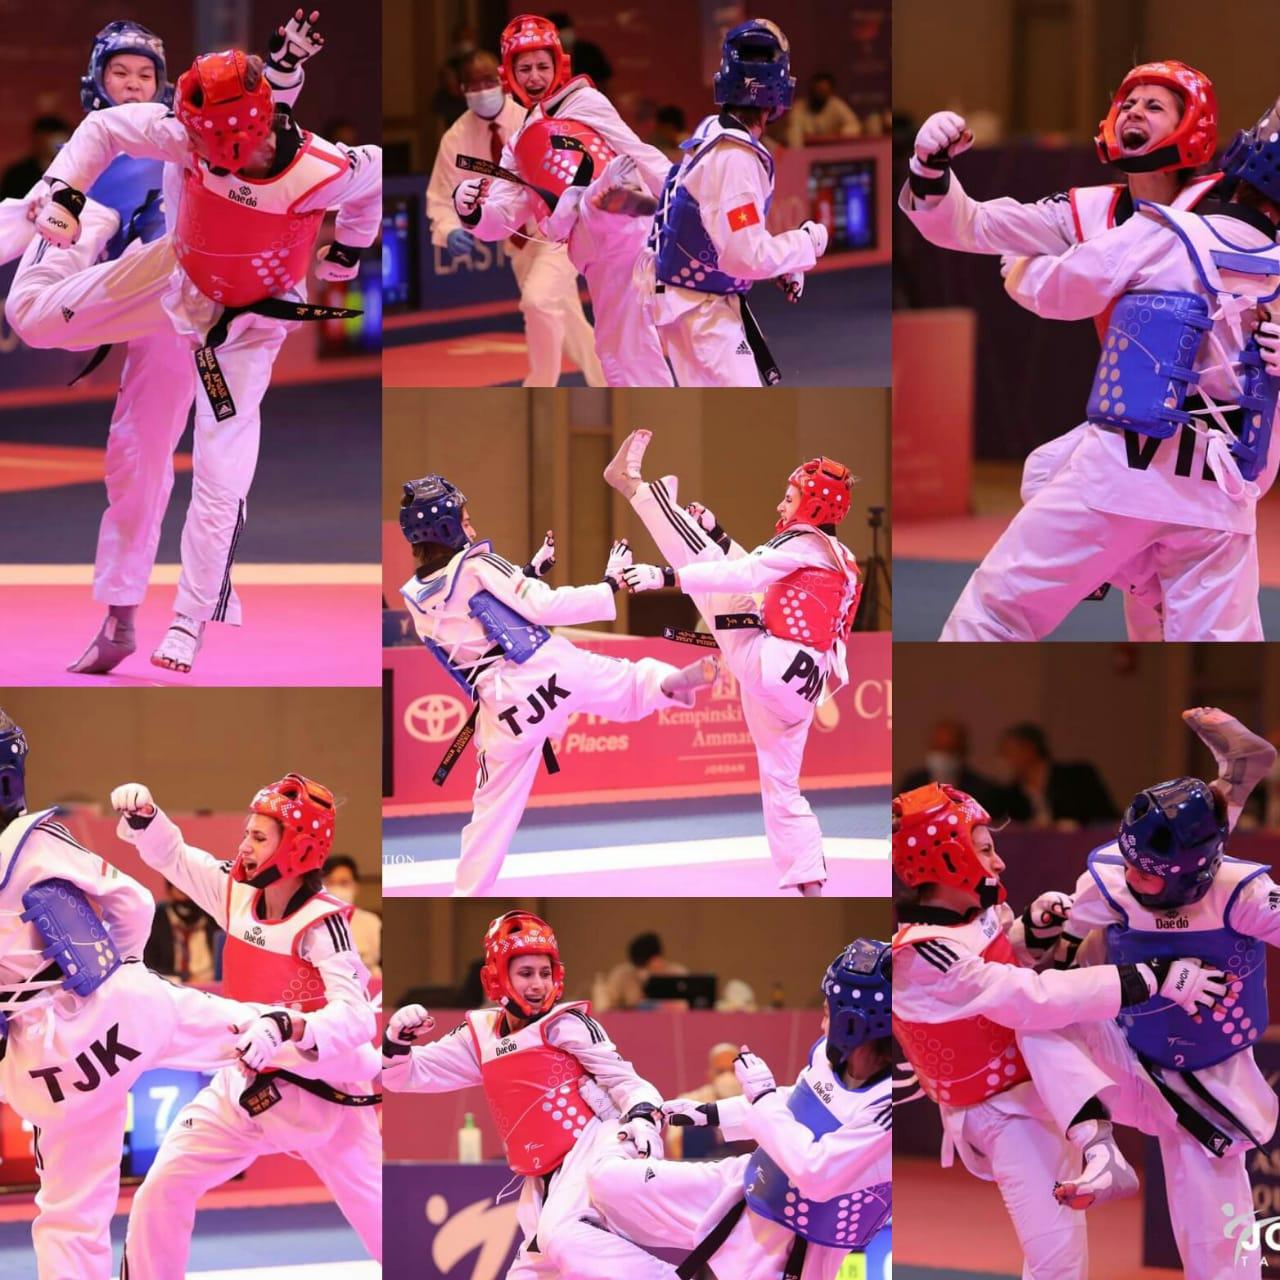 Anelia at Olympic Qualifying Round